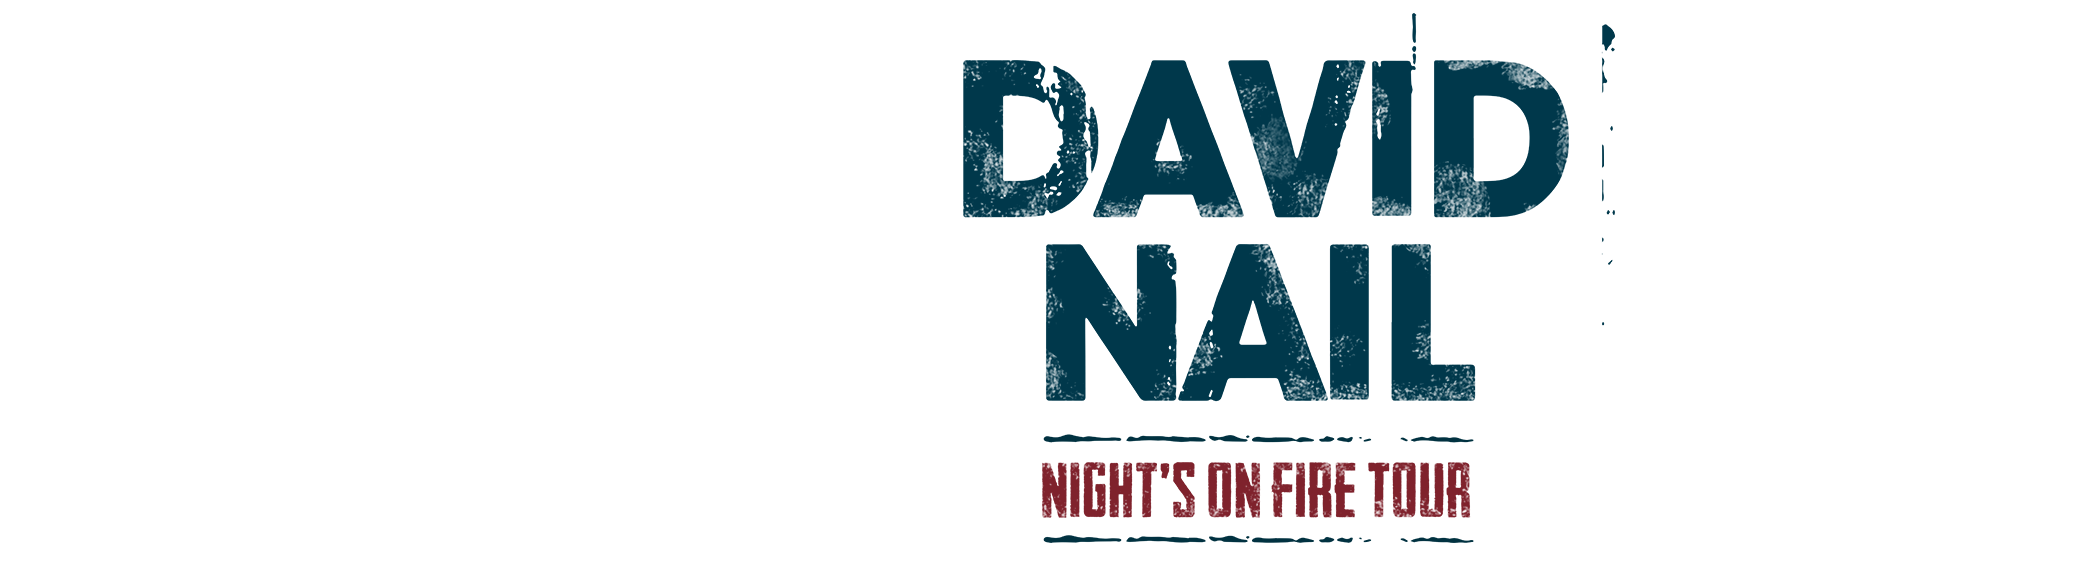 David Nail Night's On Fire Tour 2016